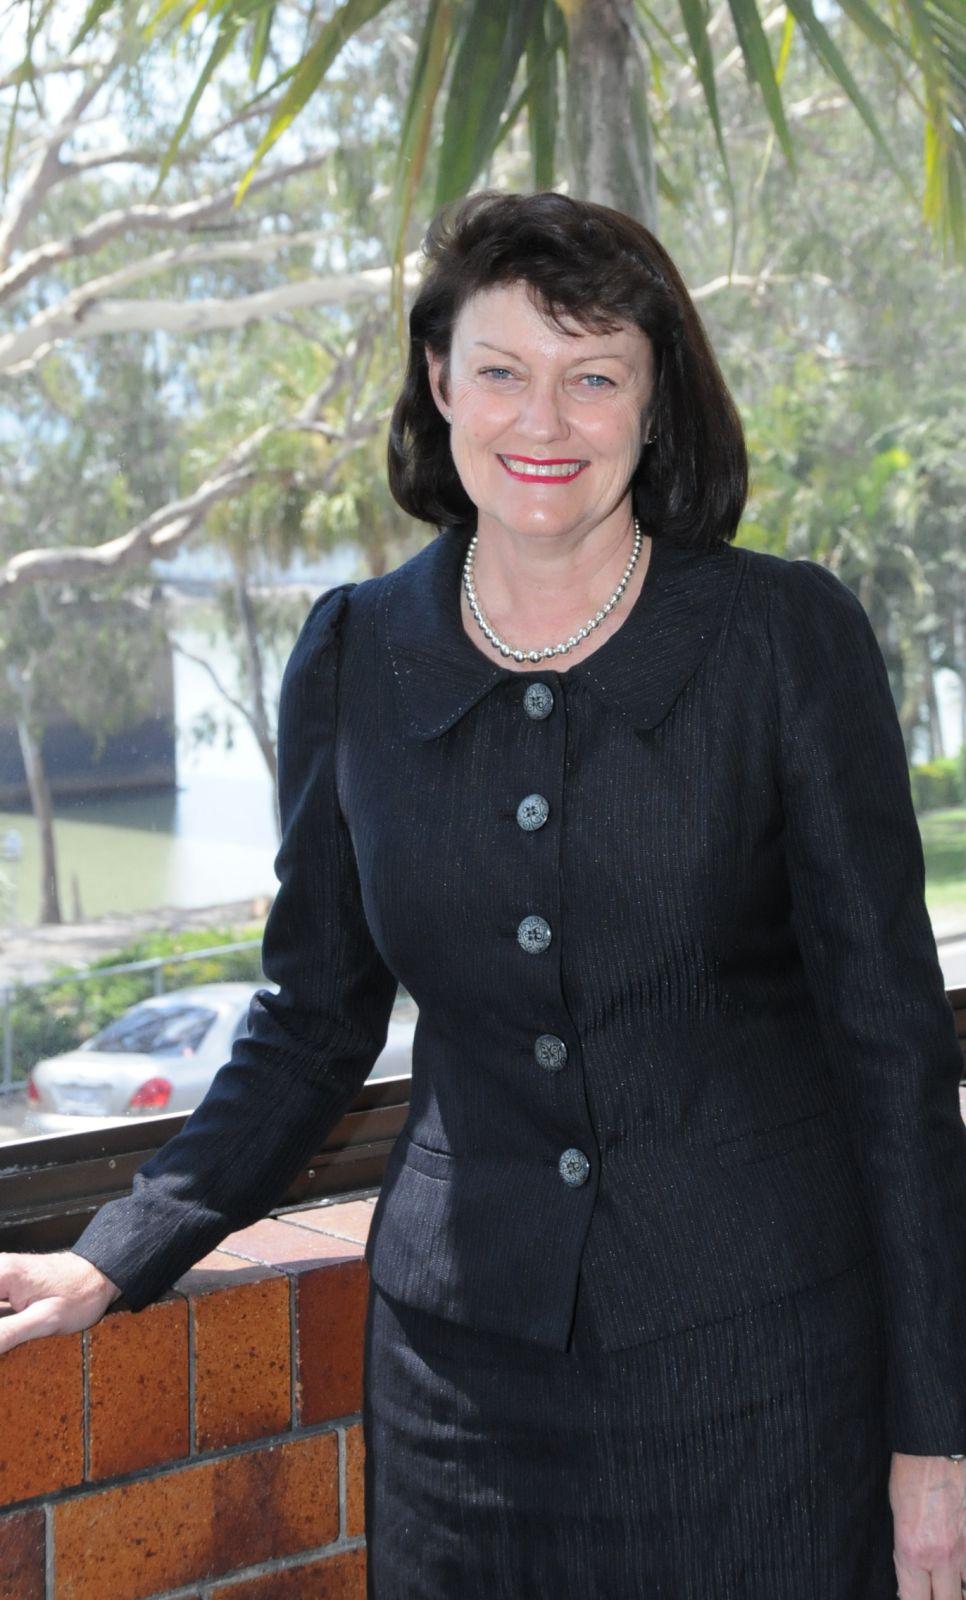 Vicki Jackson